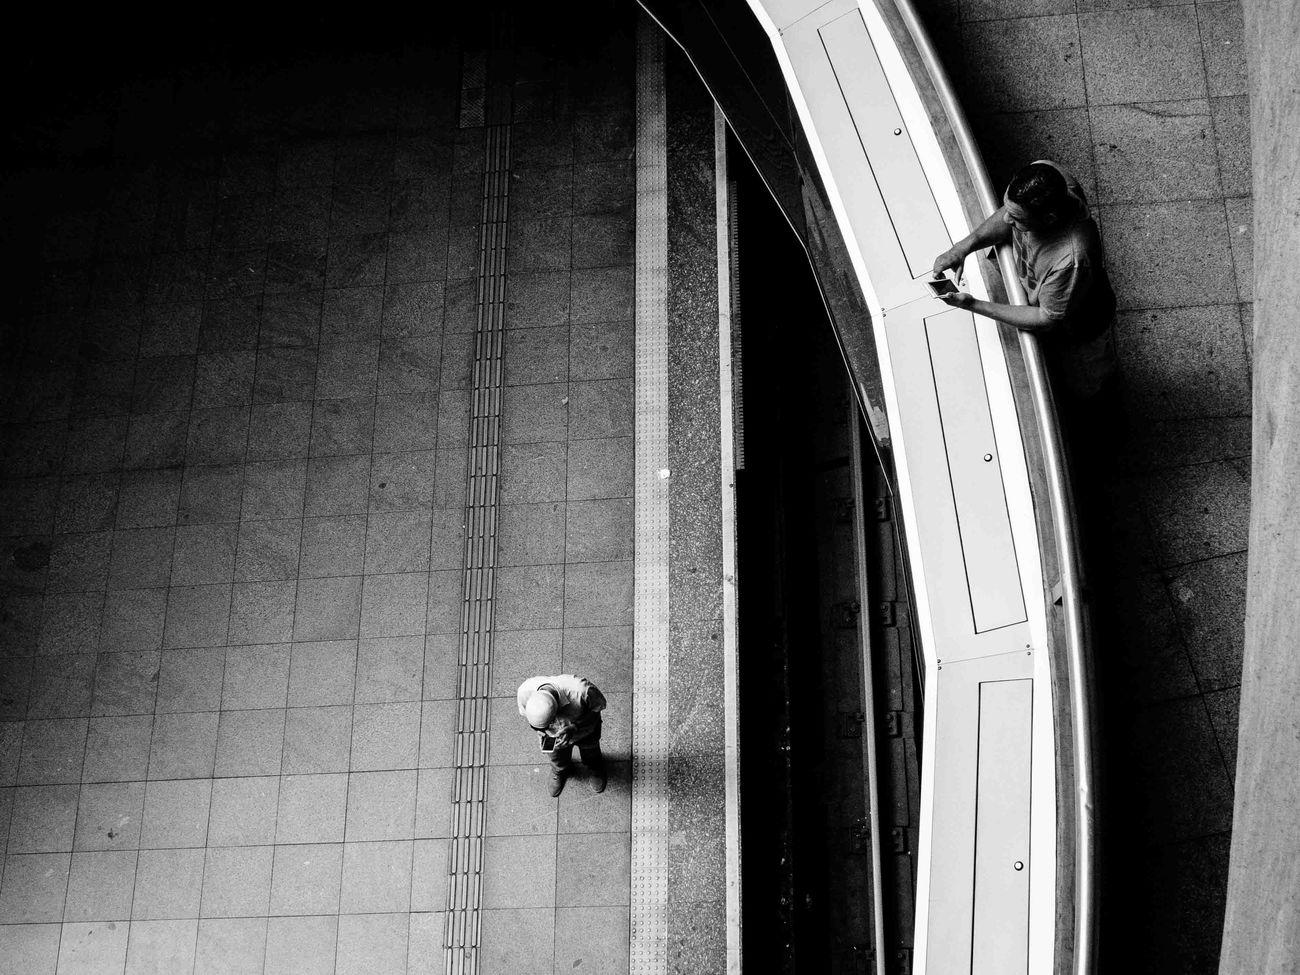 Monochrome Photography Subway Station Street Photography Fotografia De Rua São Paulo Men Vignette